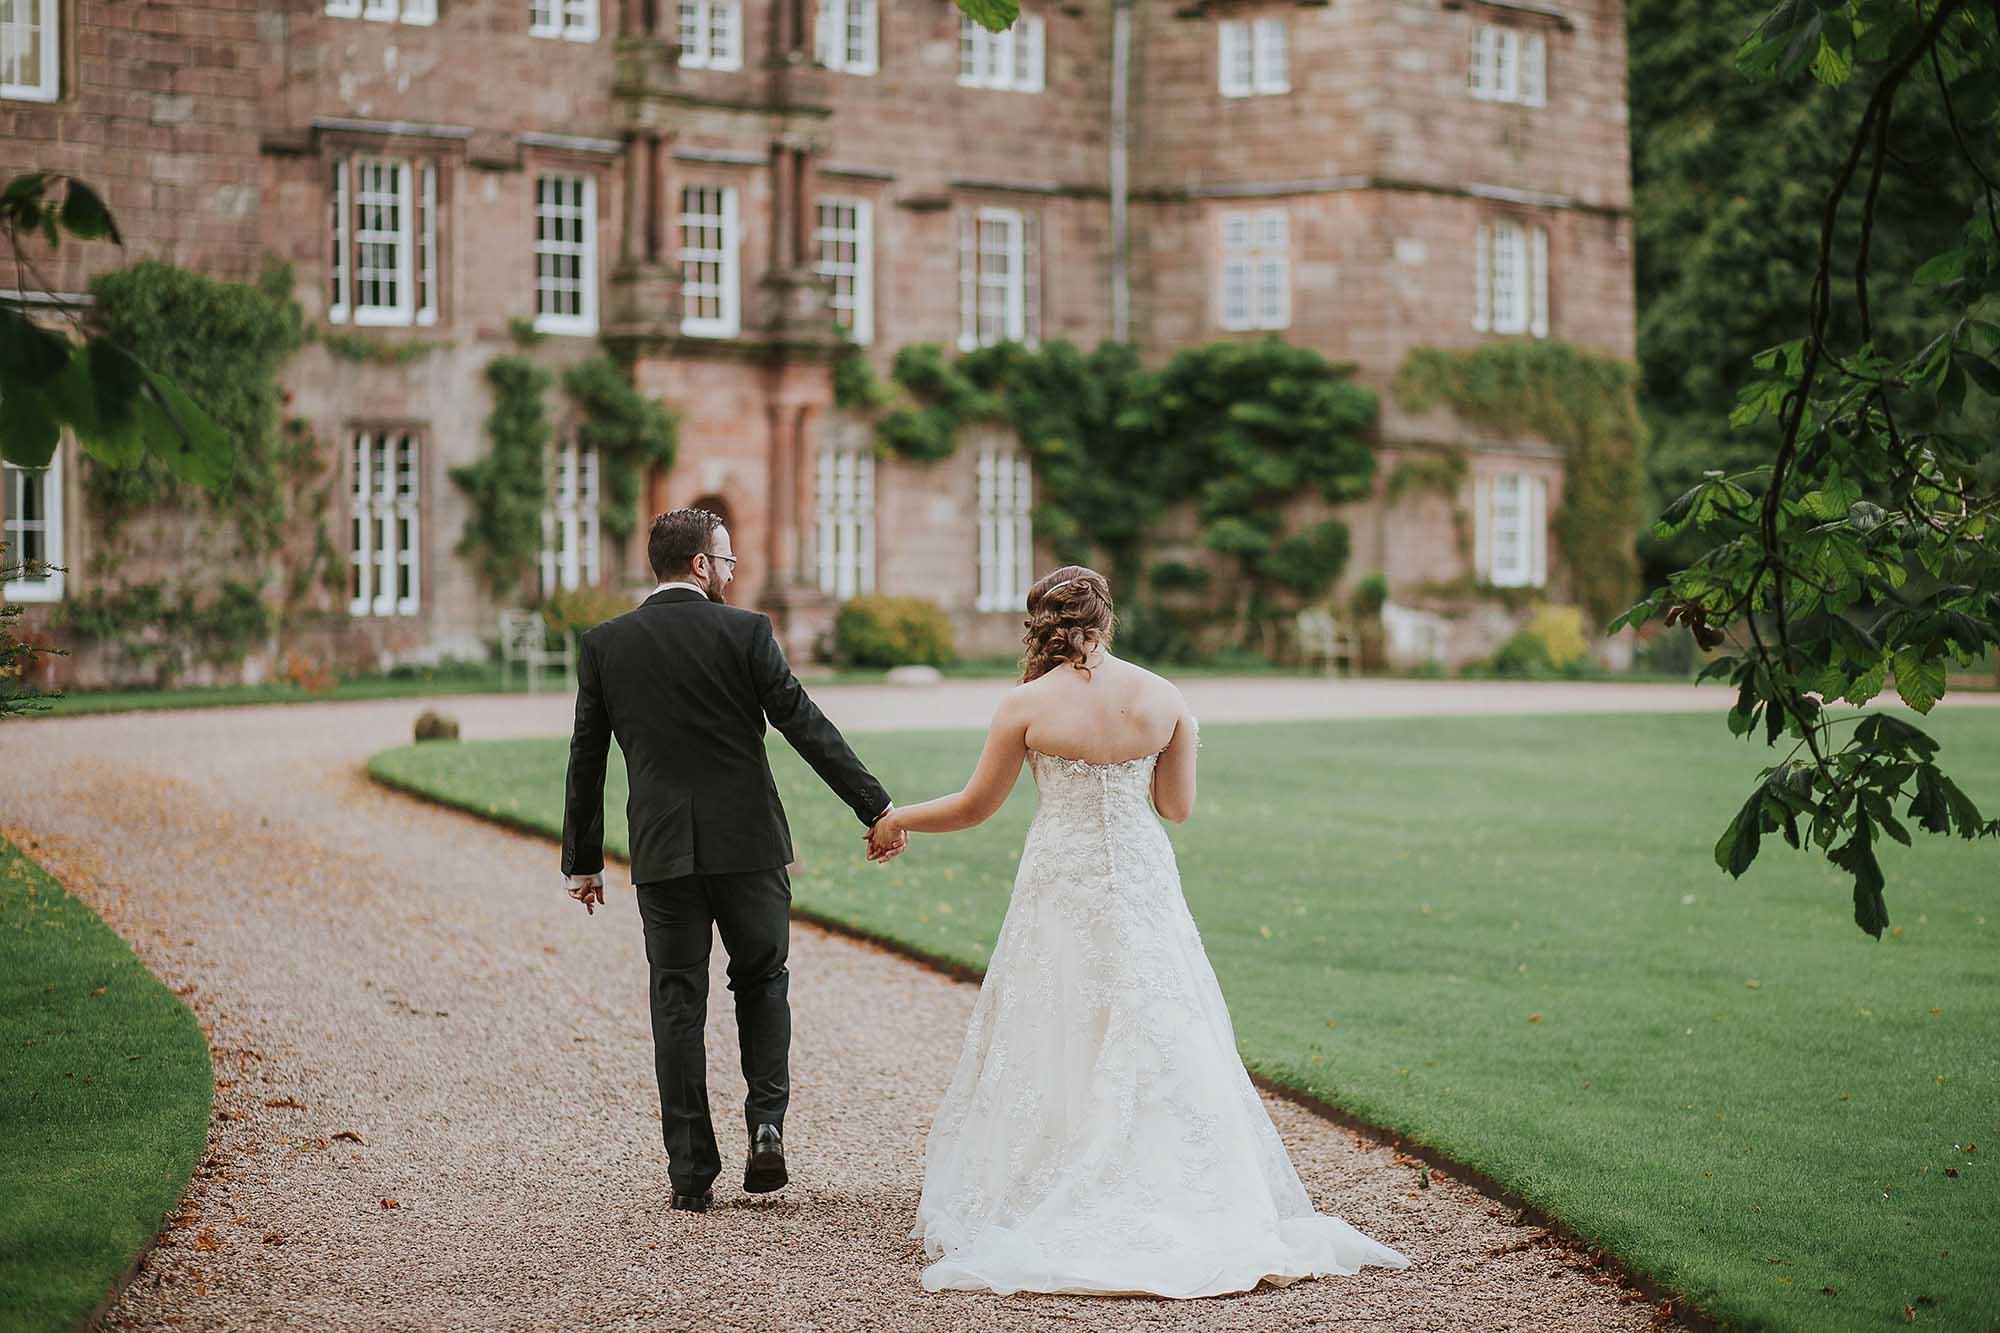 bride and groom walking outside Browsholme Hall and Tithe Barn